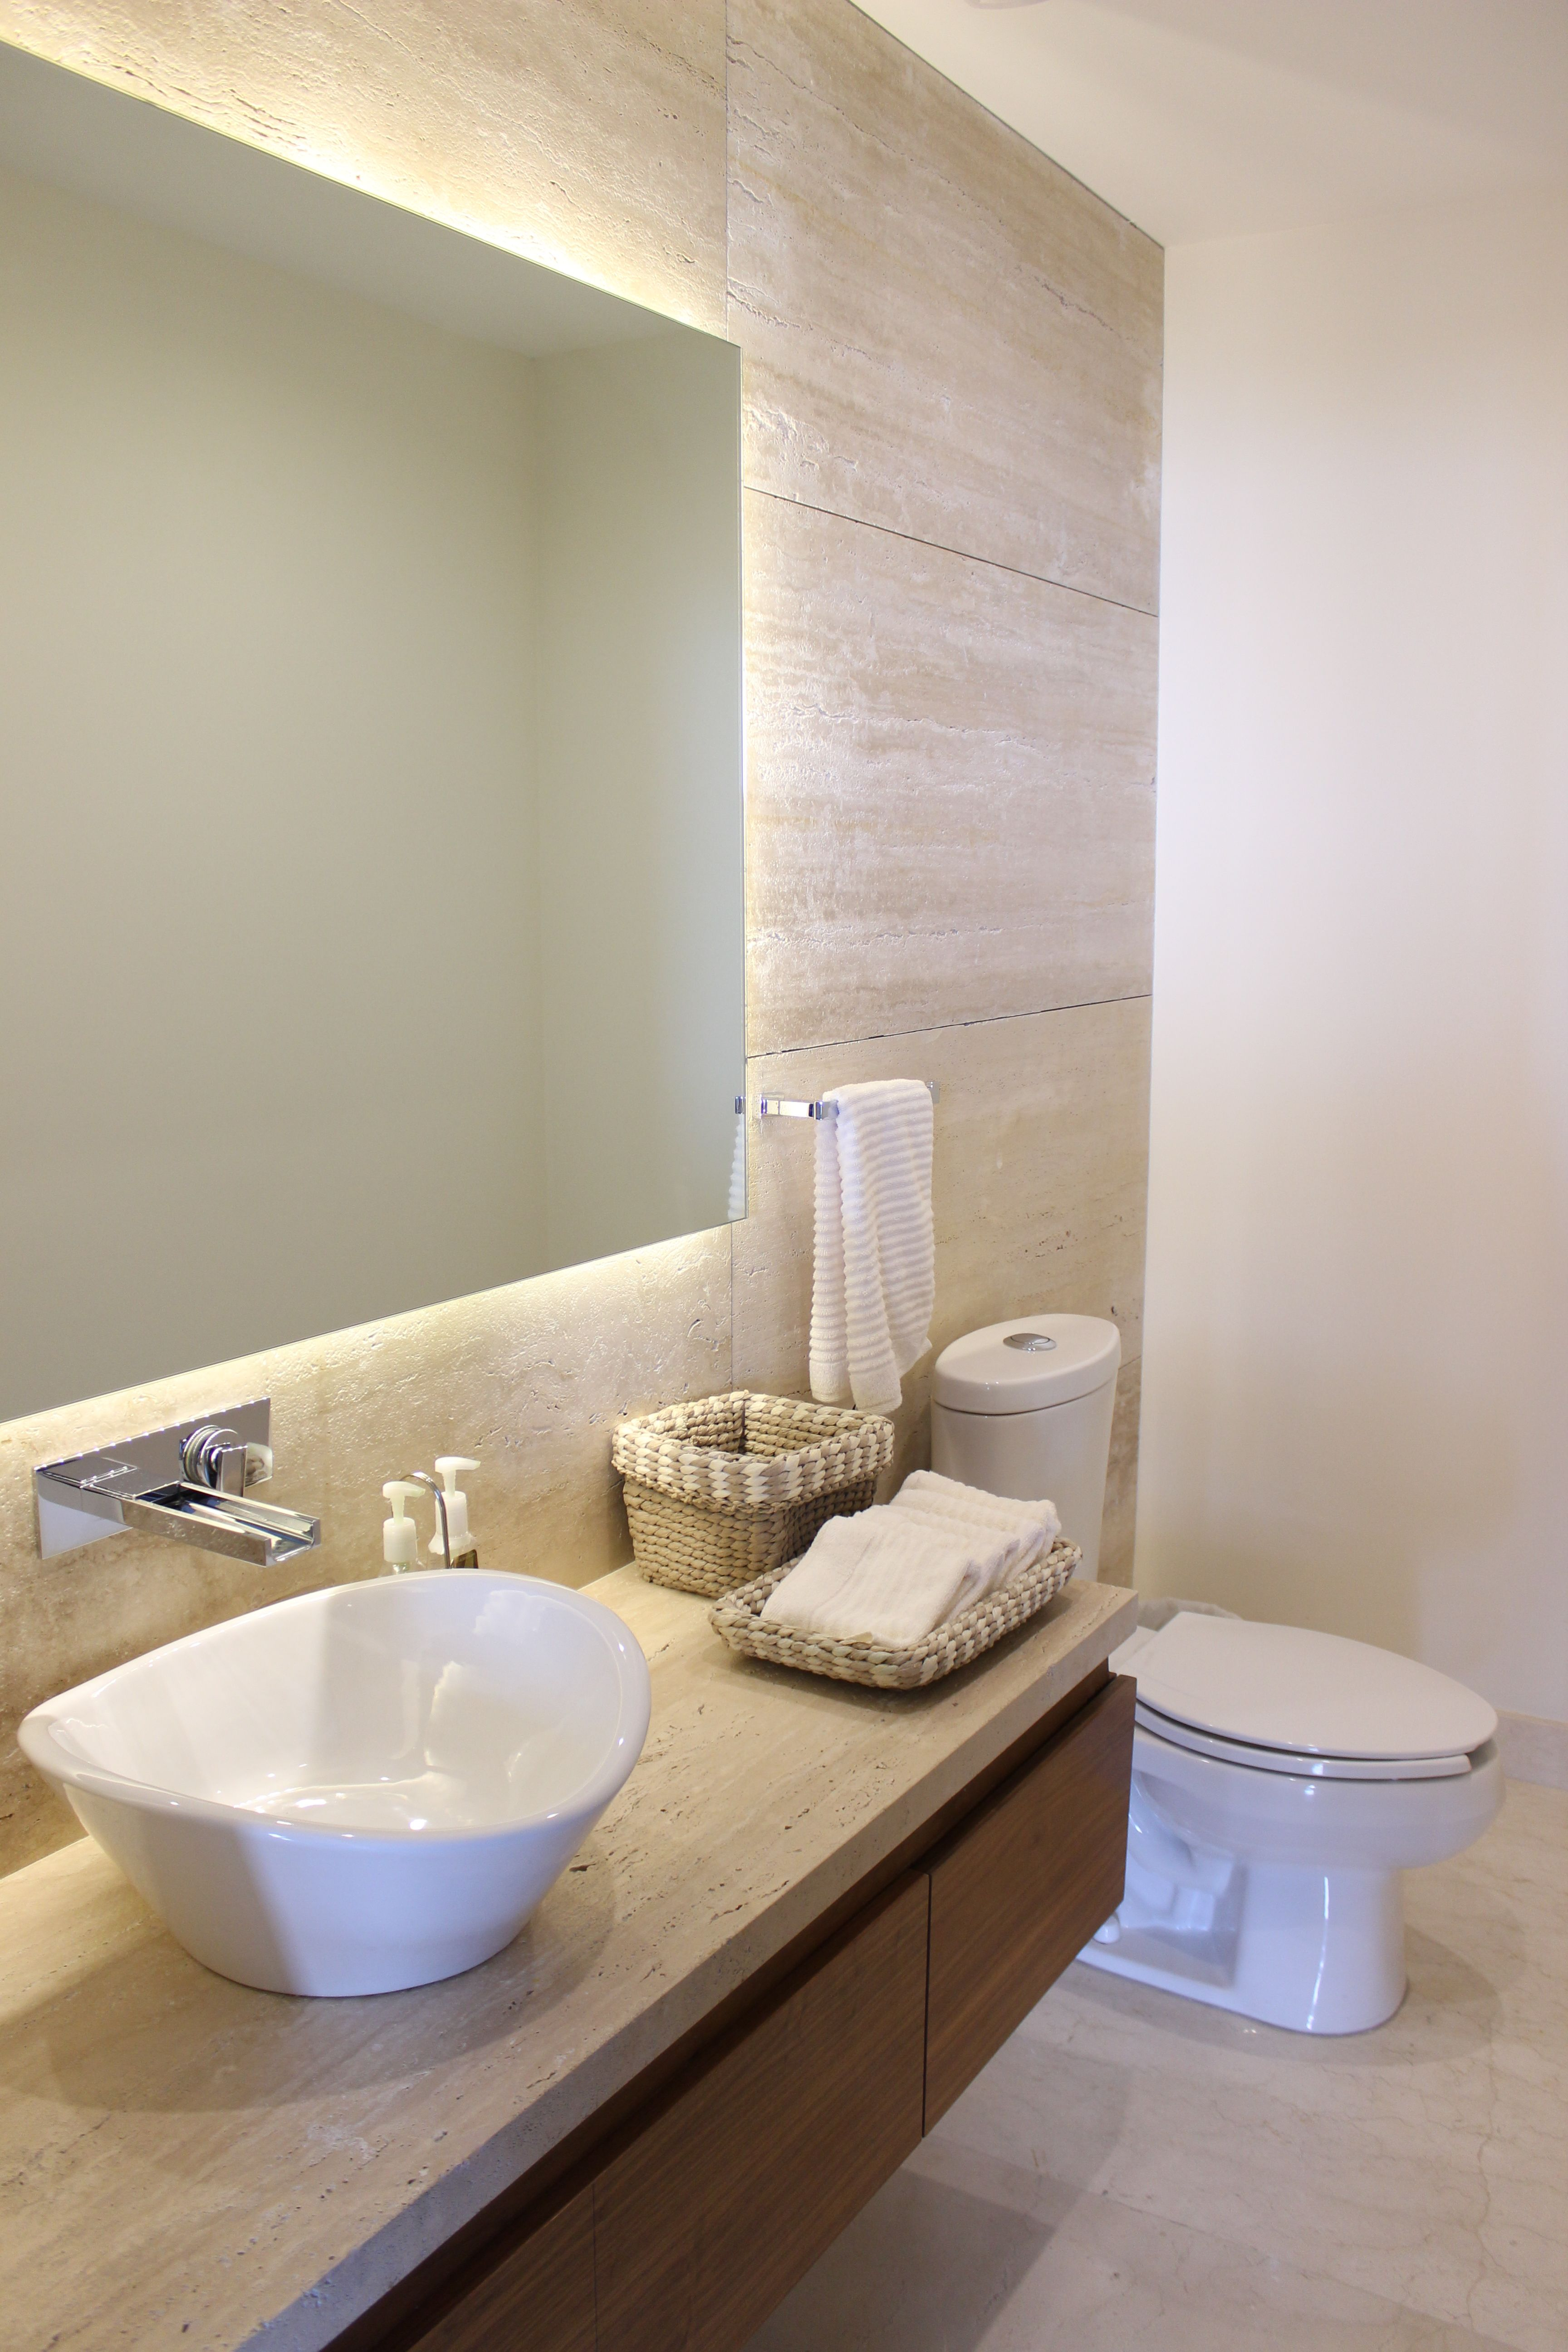 Bano Toilette De Travertino Bano Marmol Muebles De Bano Marmol